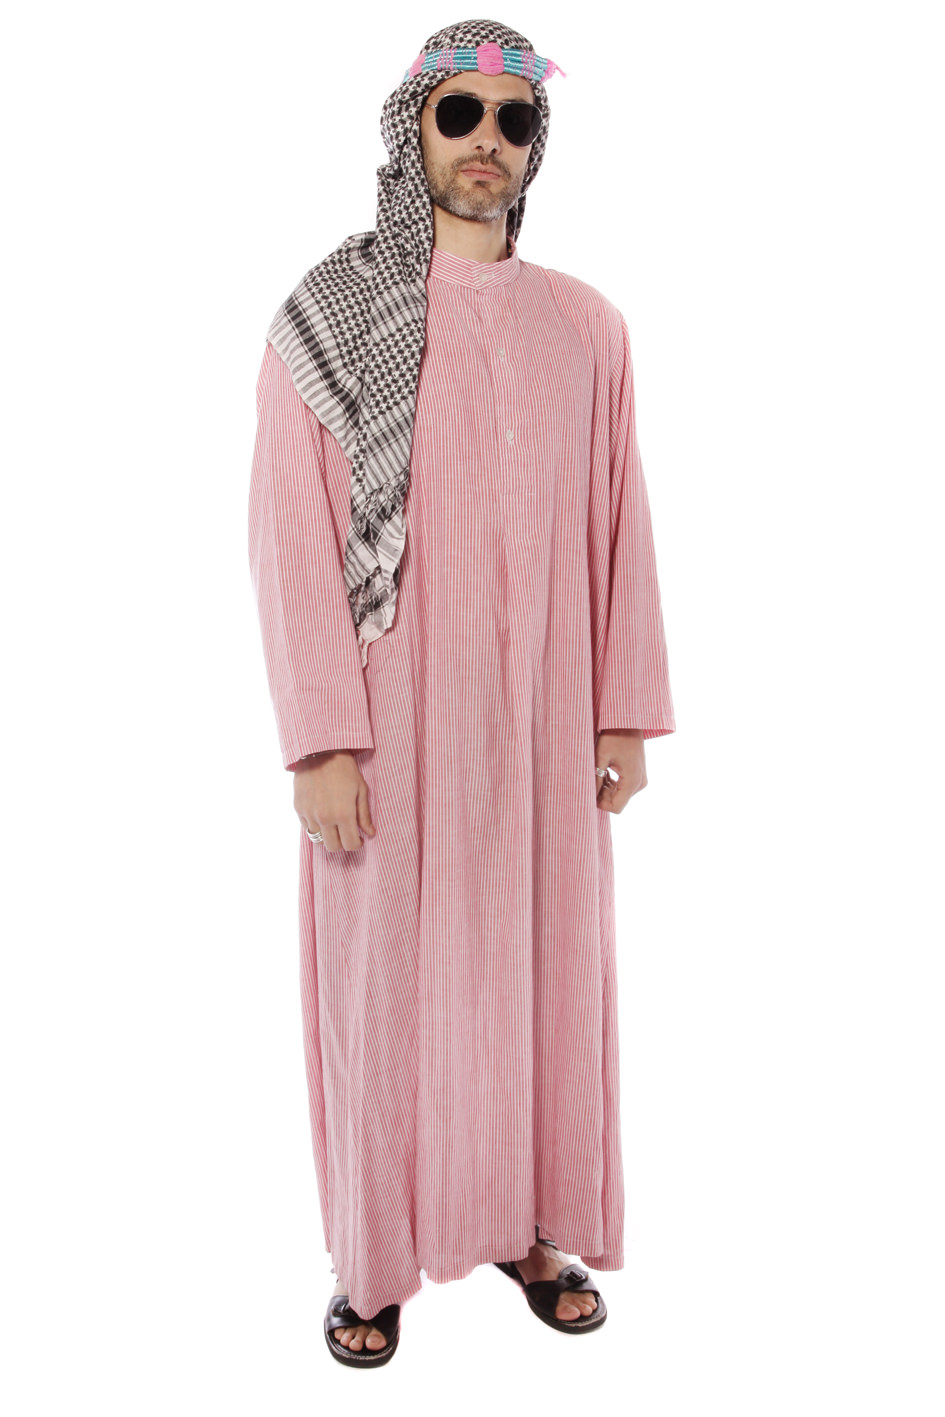 ARABIC SHEIK PINK STRIPES COSTUME WITH HEADDRESs